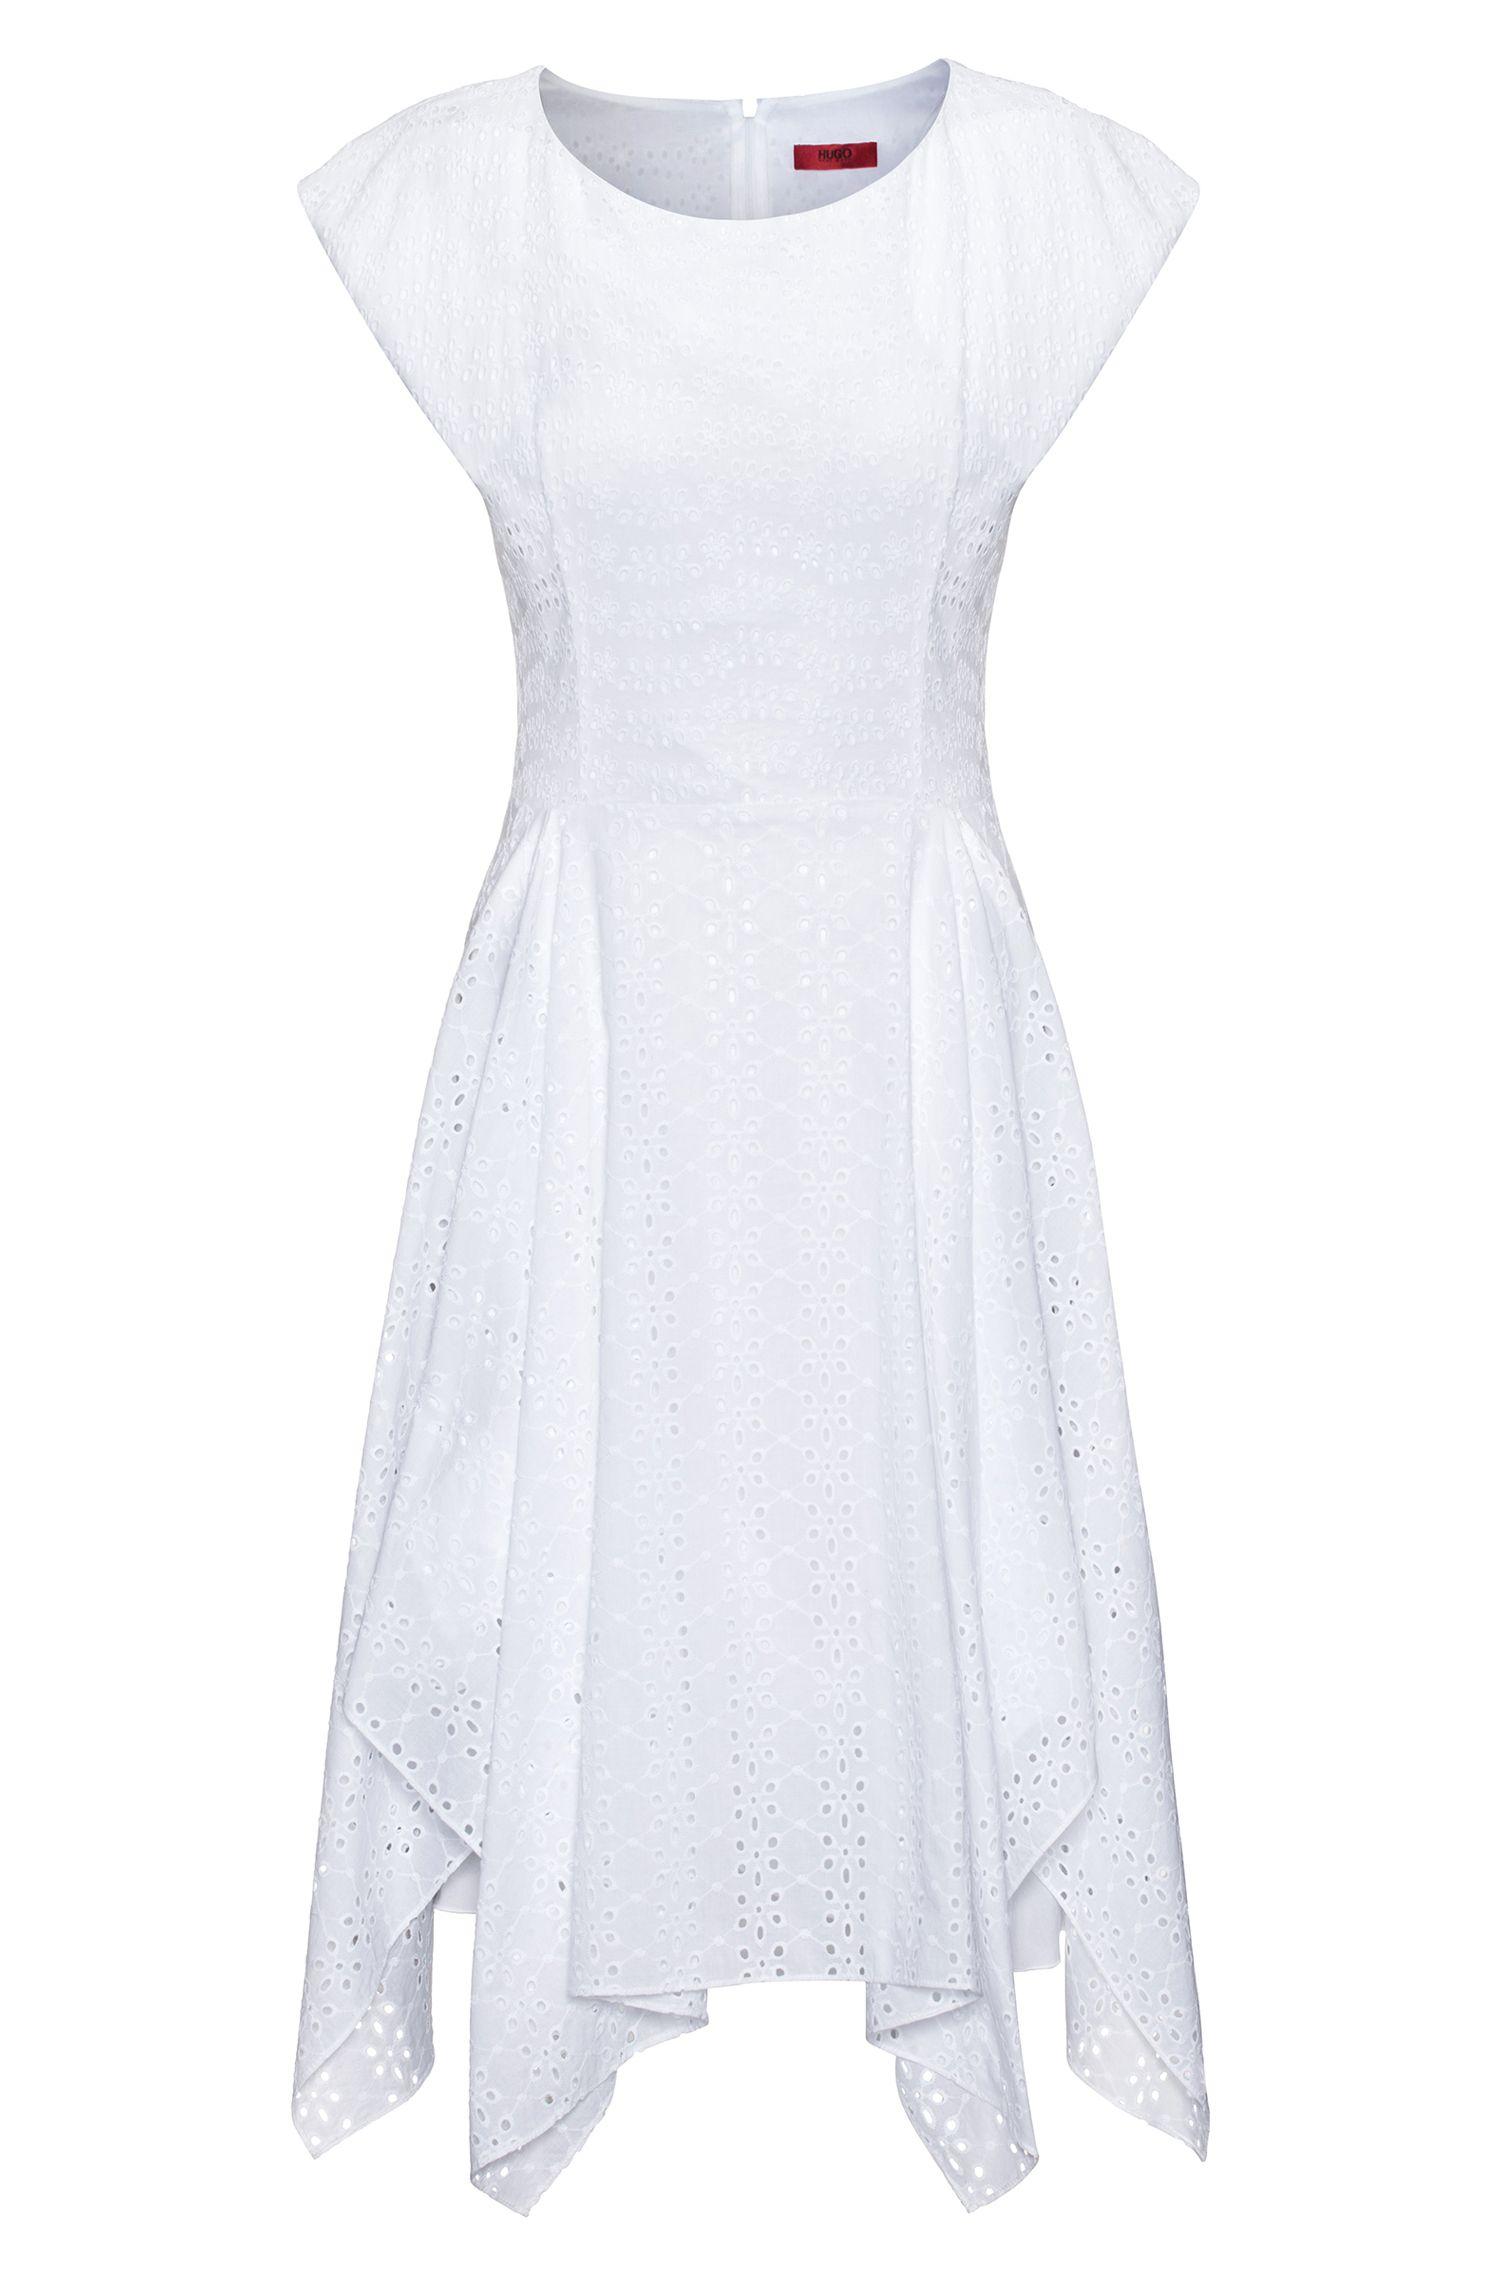 Cotton broderie anglaise dress with handkerchief hem